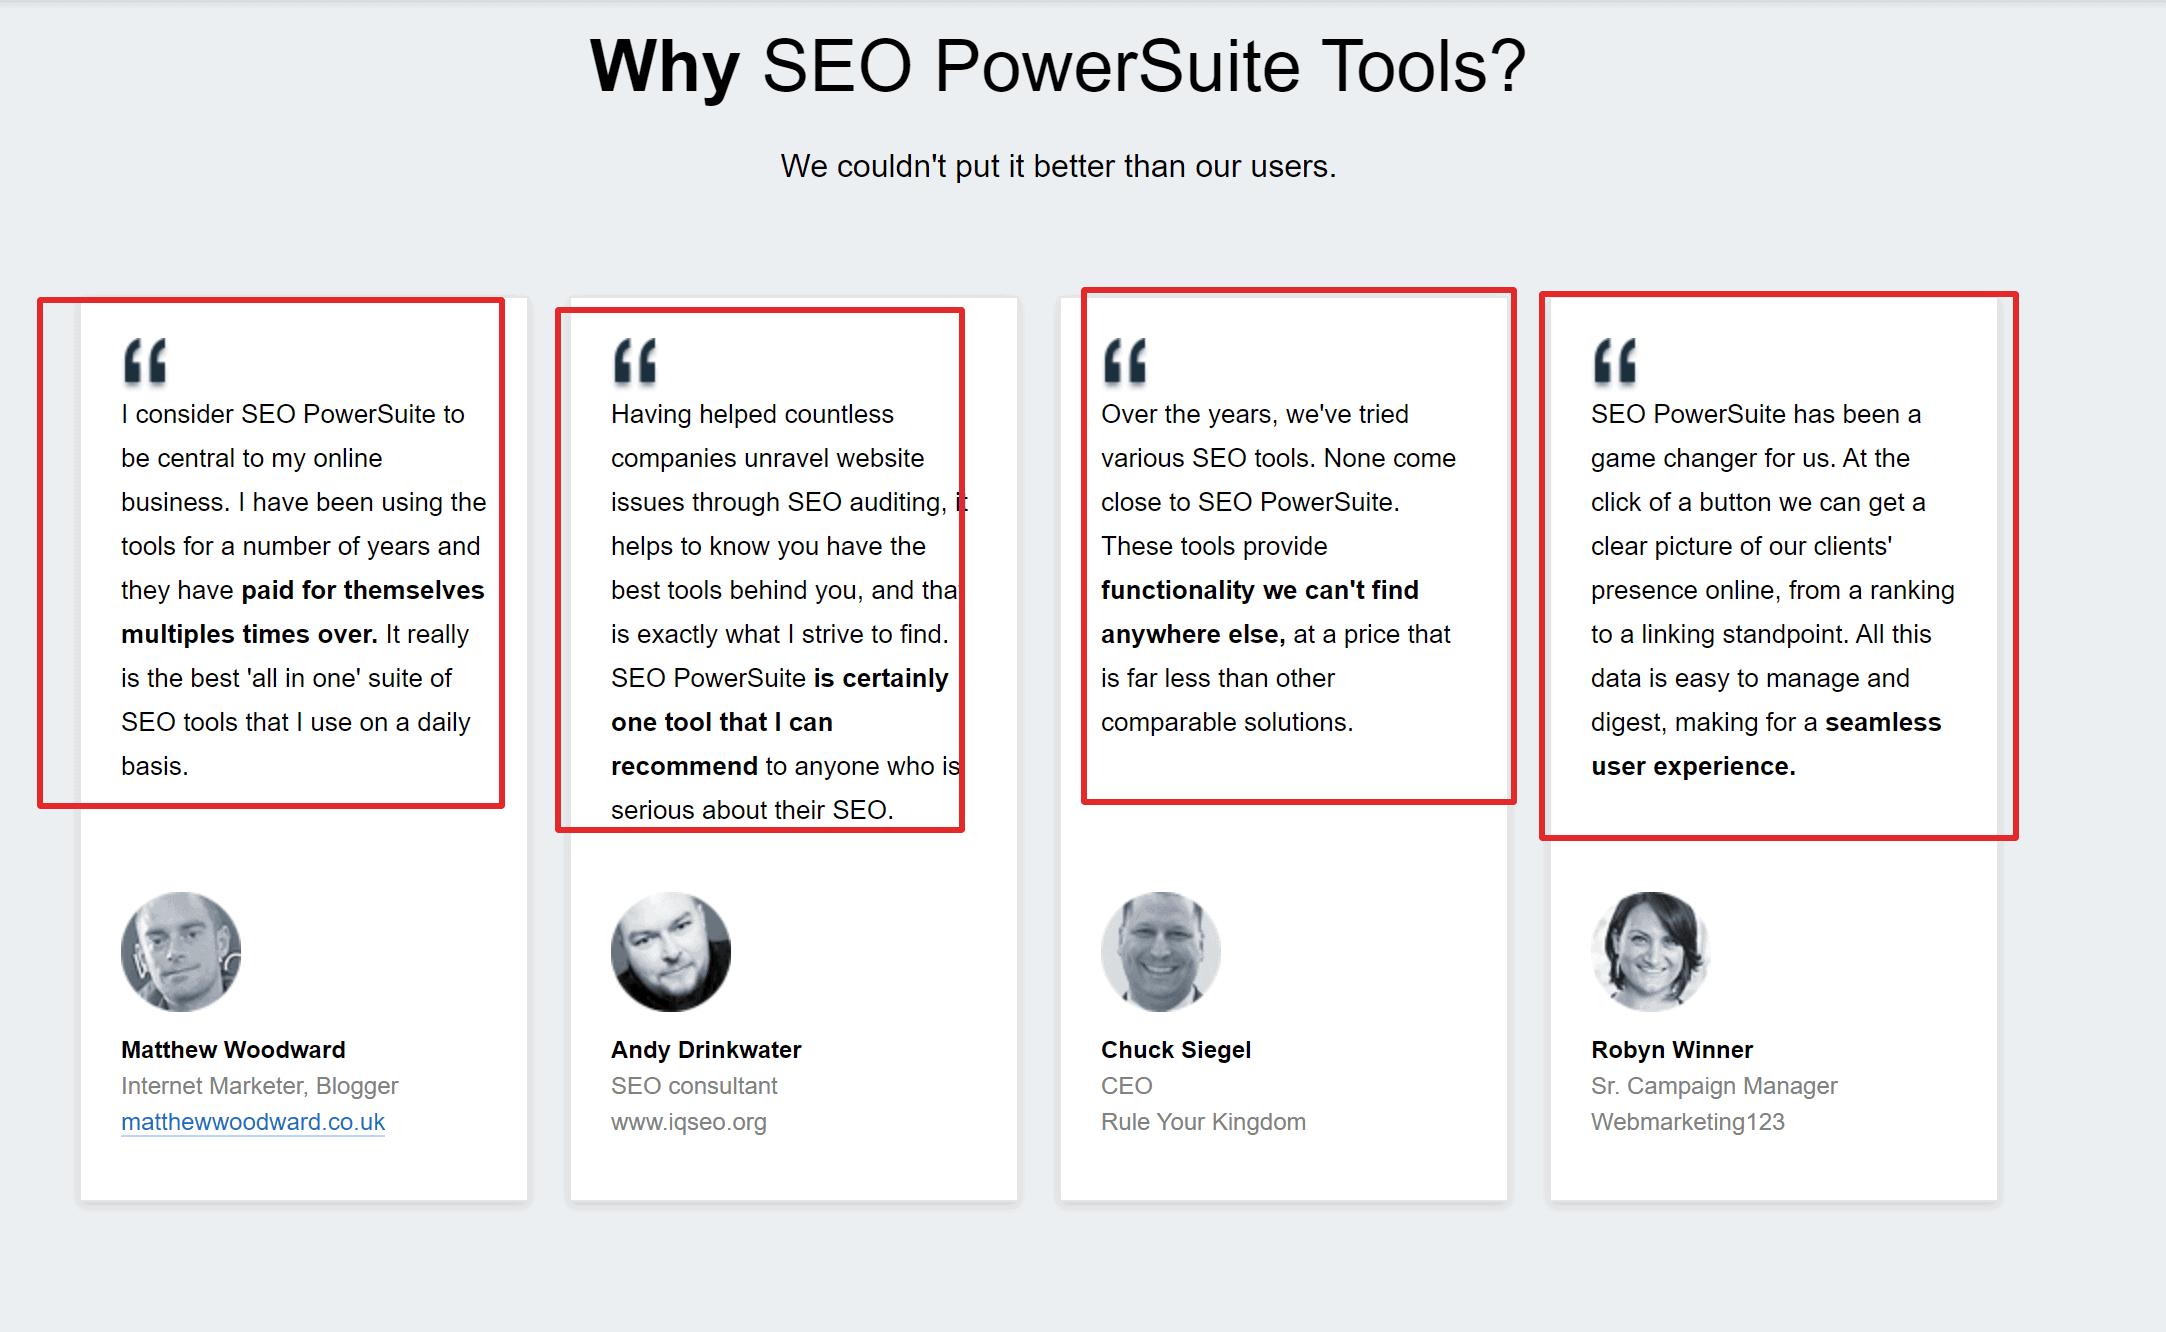 Seo powersuite reviews online